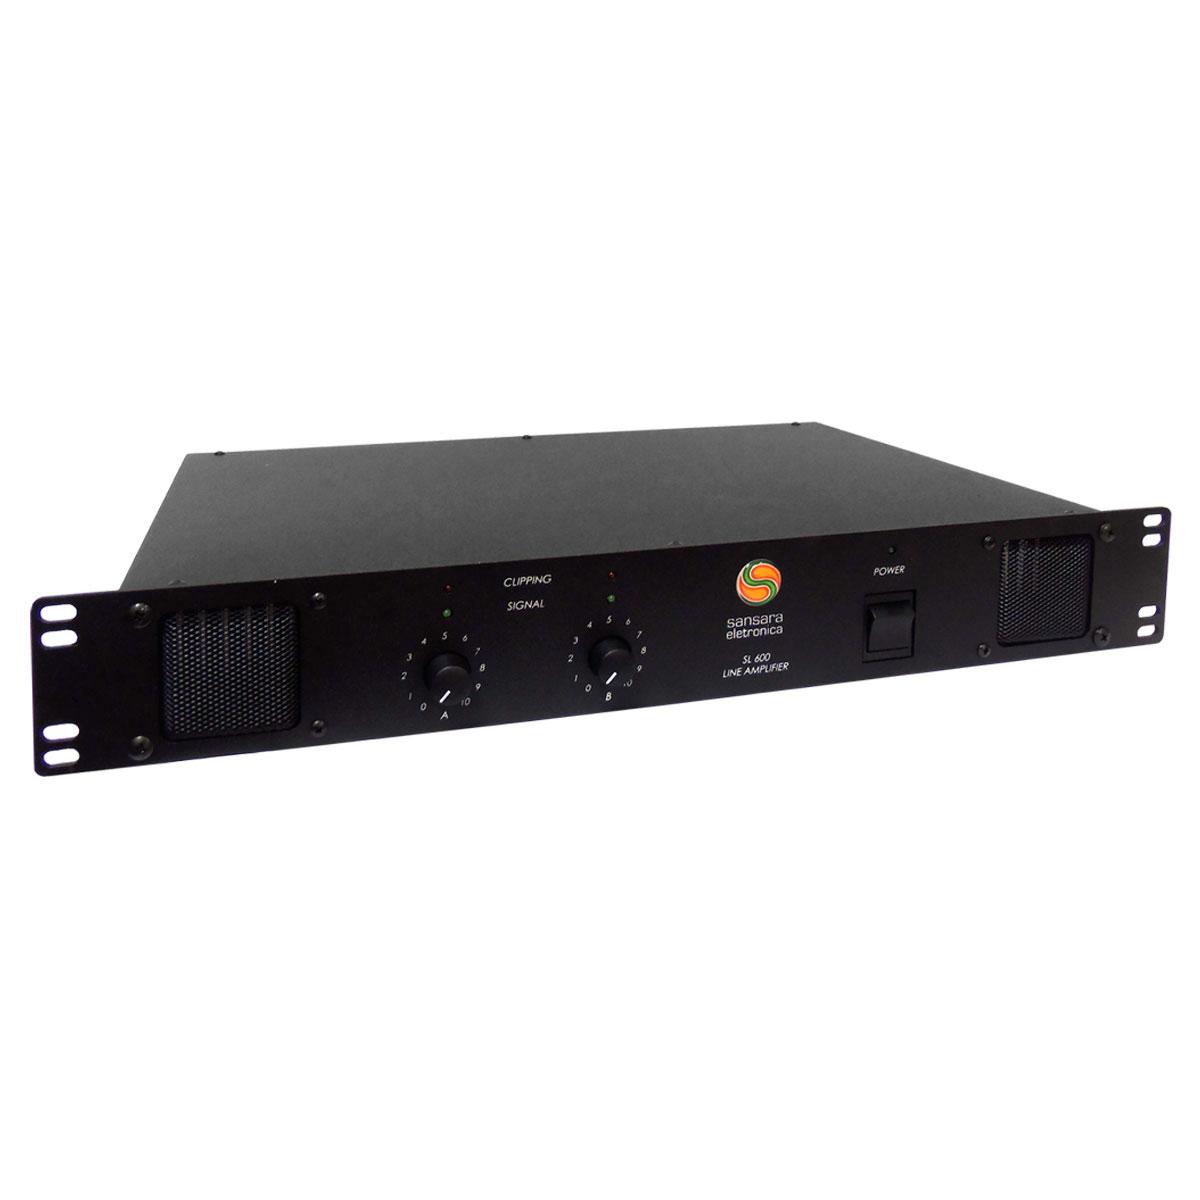 SL600 - Amplificador de Linha Estéreo 600W SL 600 - Sansara